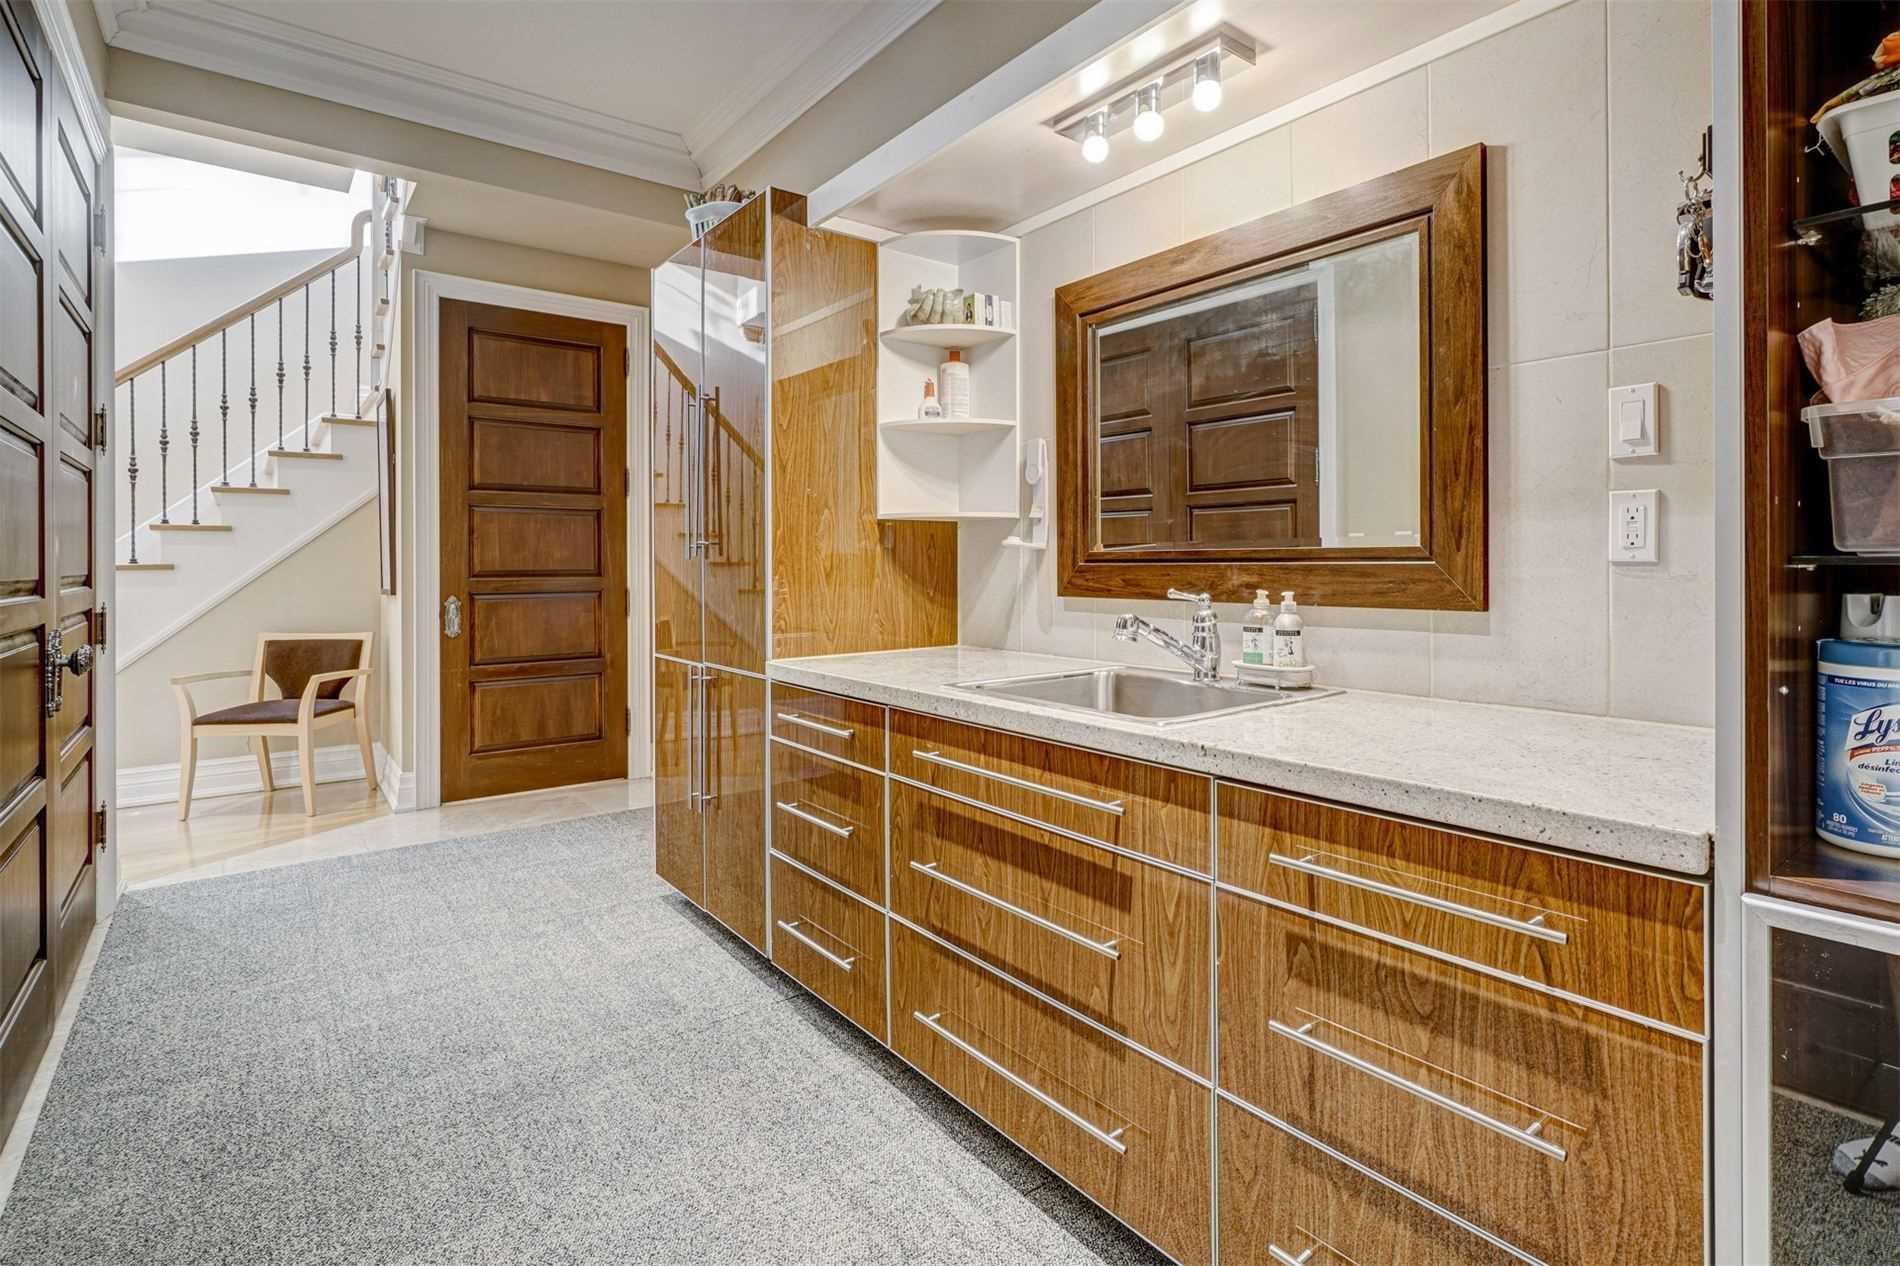 105 Duncan Rd - Langstaff Detached for sale, 4 Bedrooms (N5237187) - #23